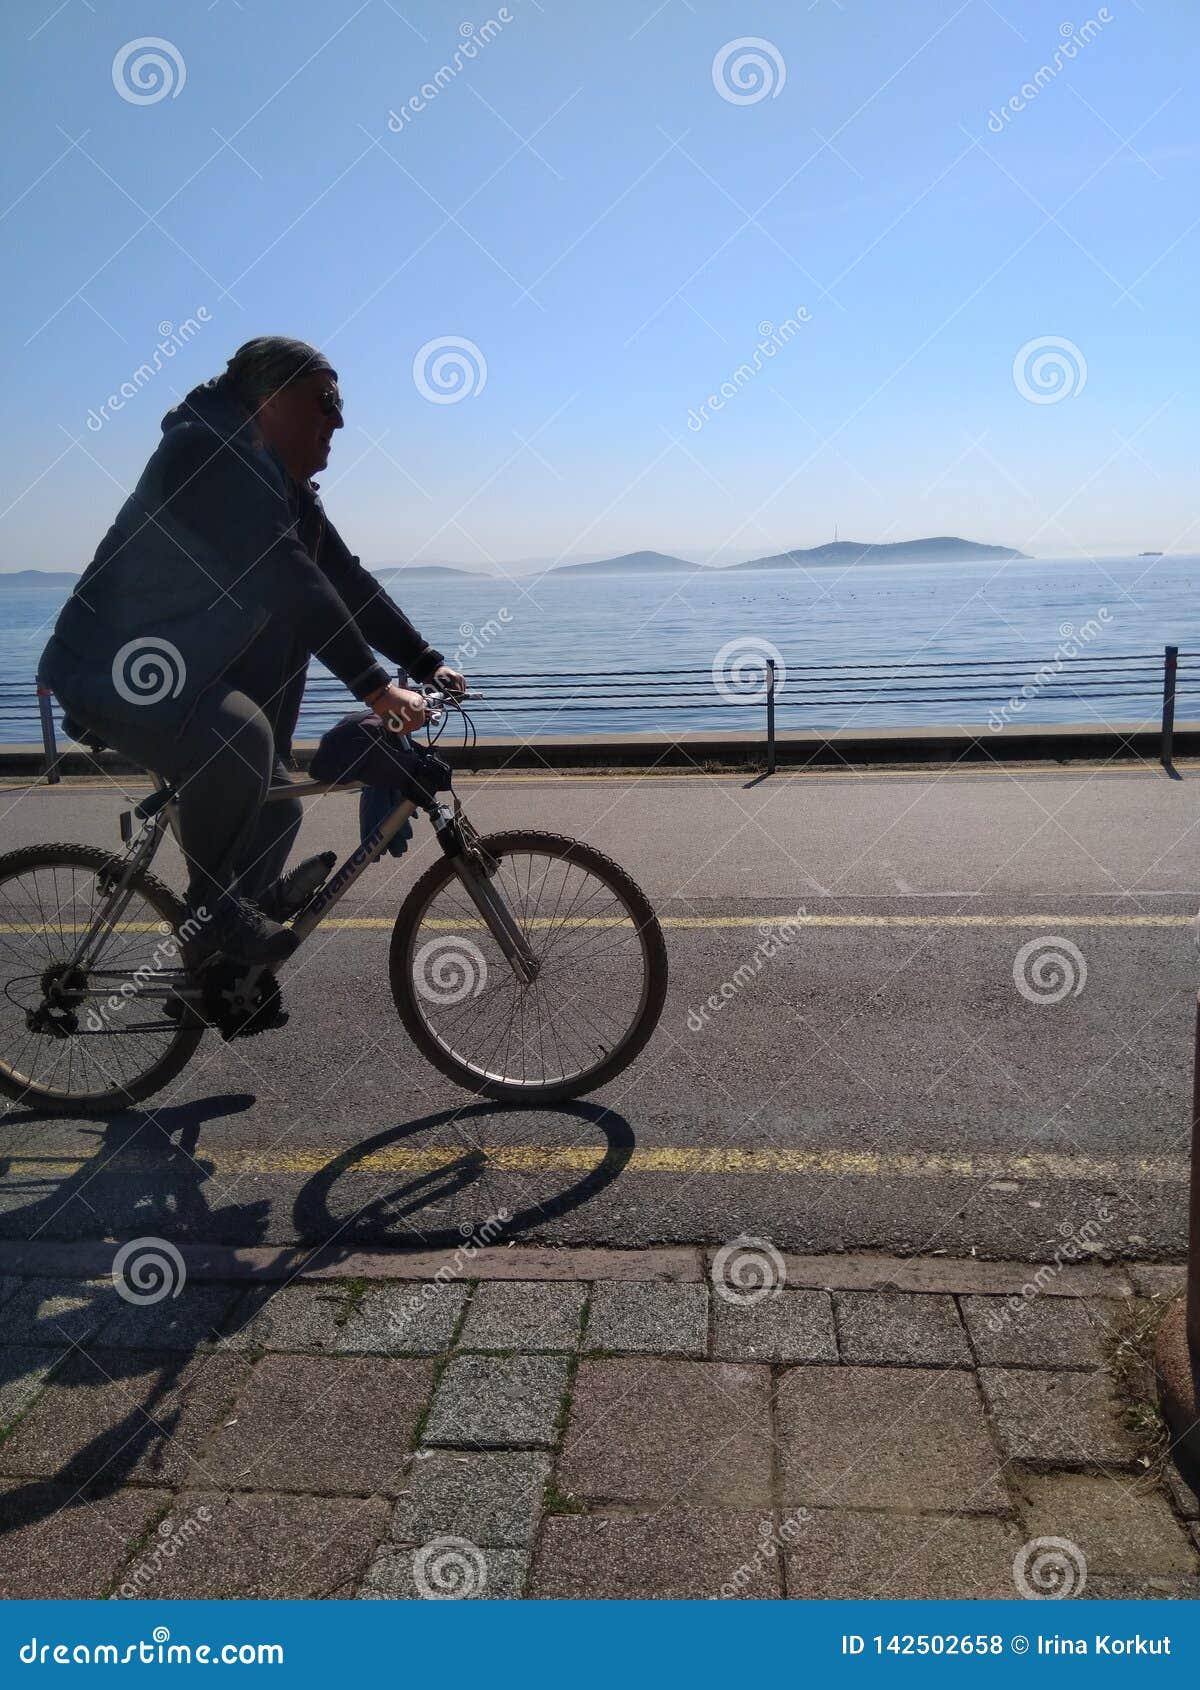 Man riding bicycle near the sea